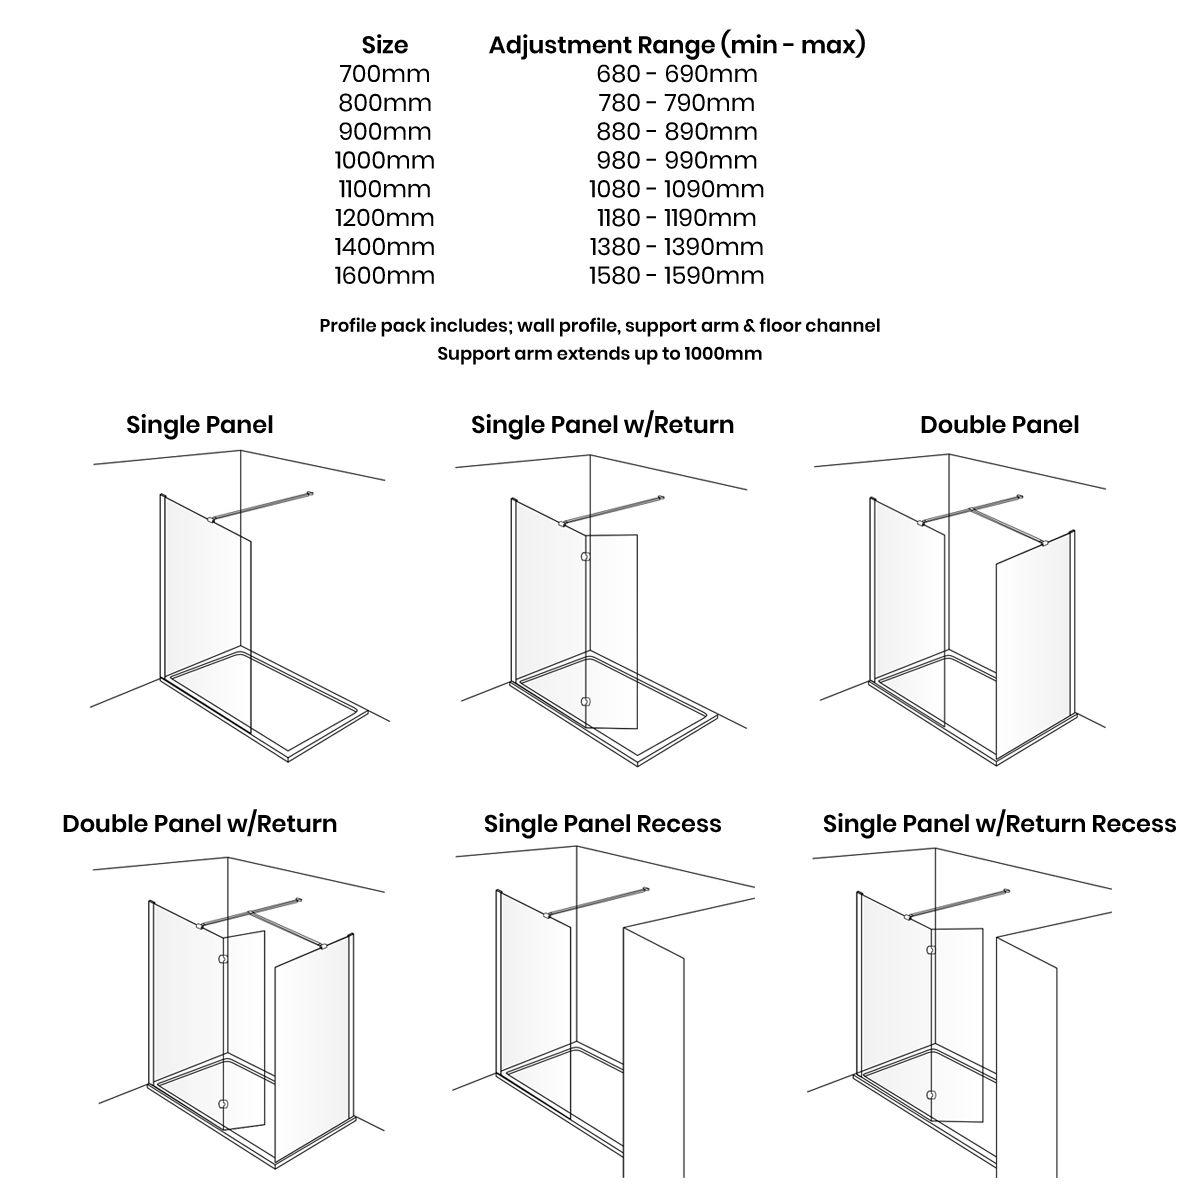 Aquadart Wet Room 10 Polished Silver Wet Room Shower Enclosure with Optional Side Panel Dimensions